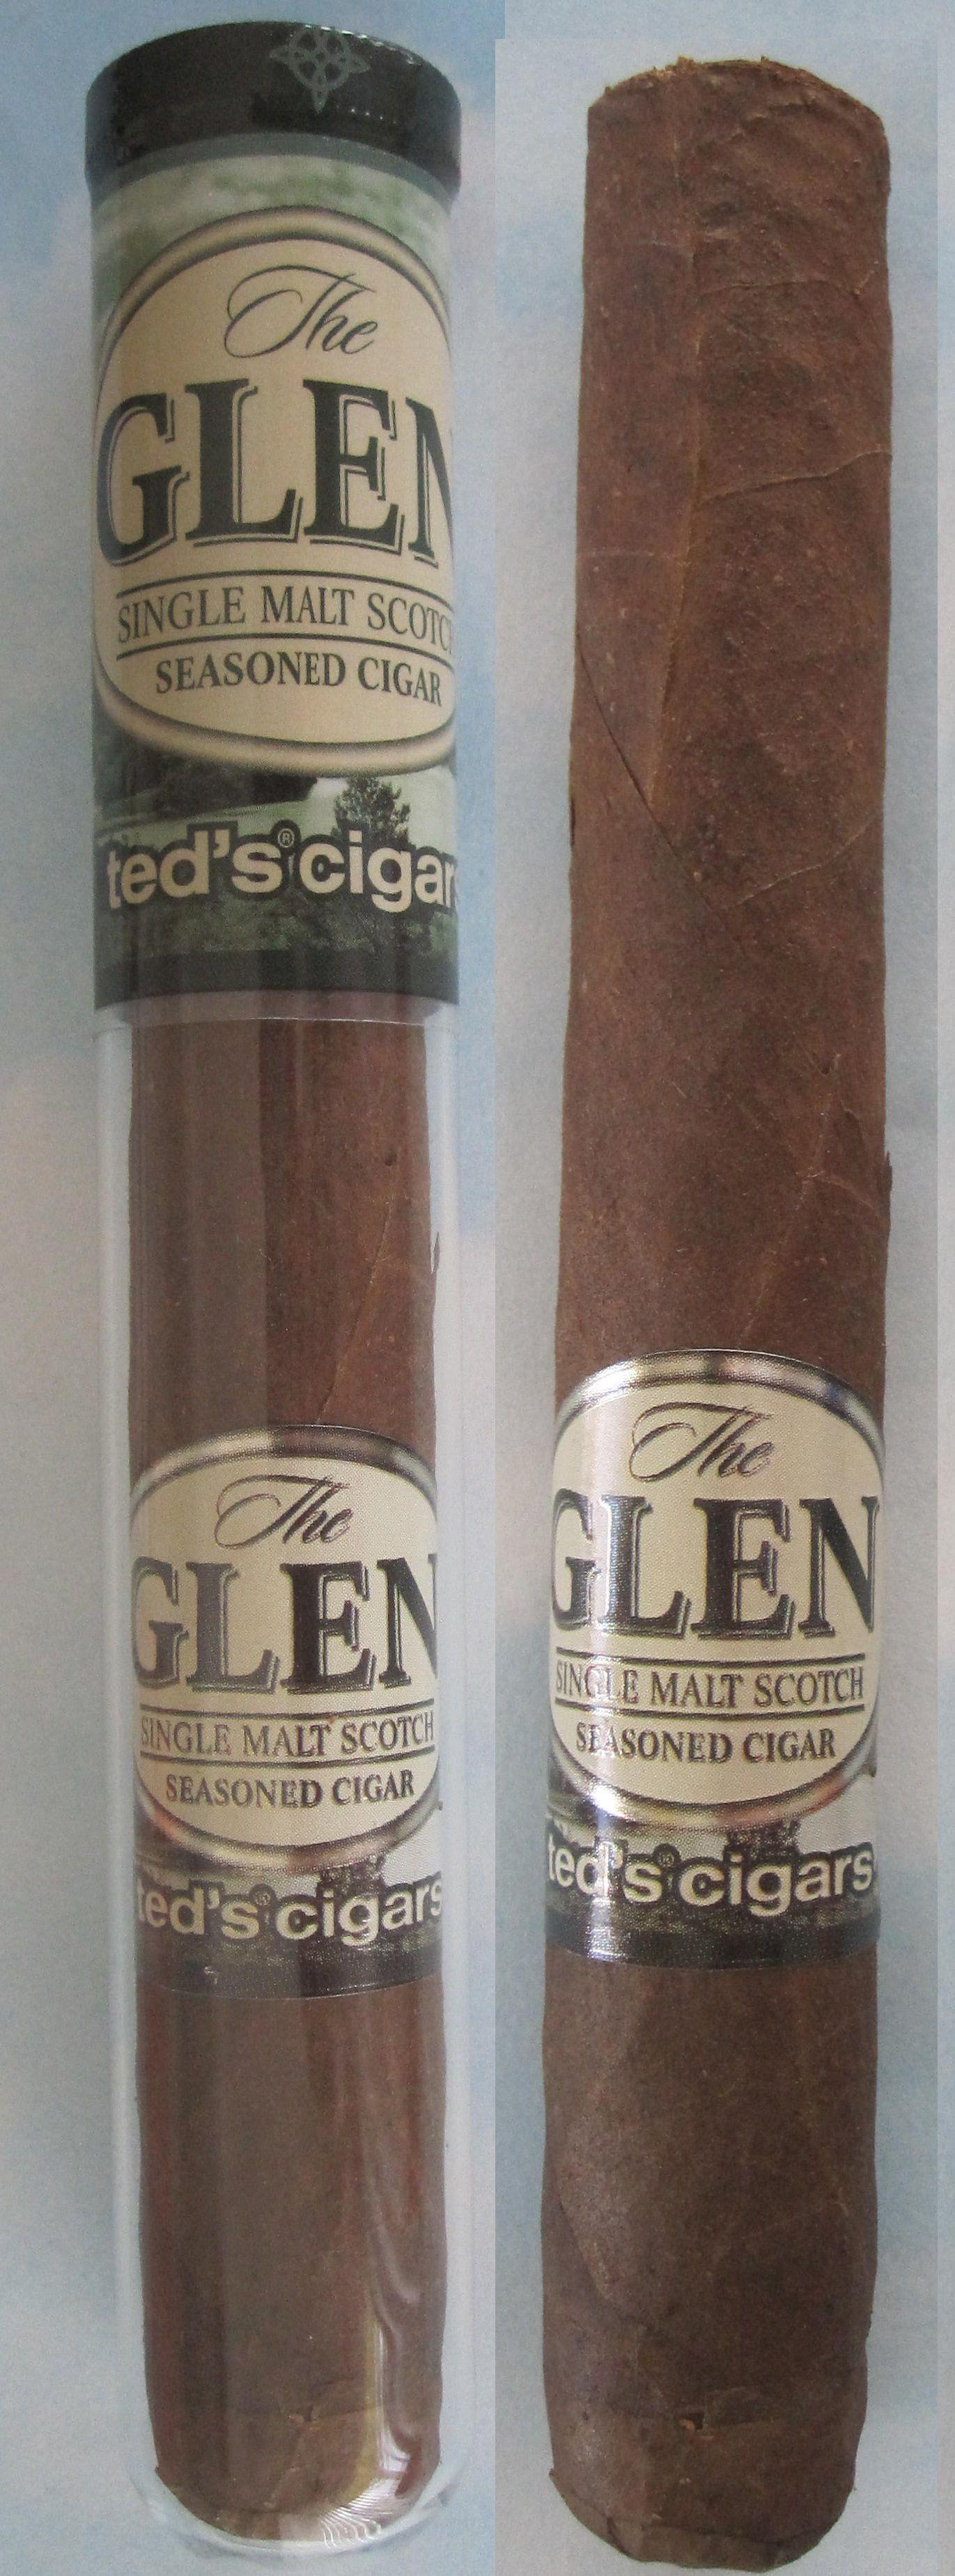 The Glen Cigar